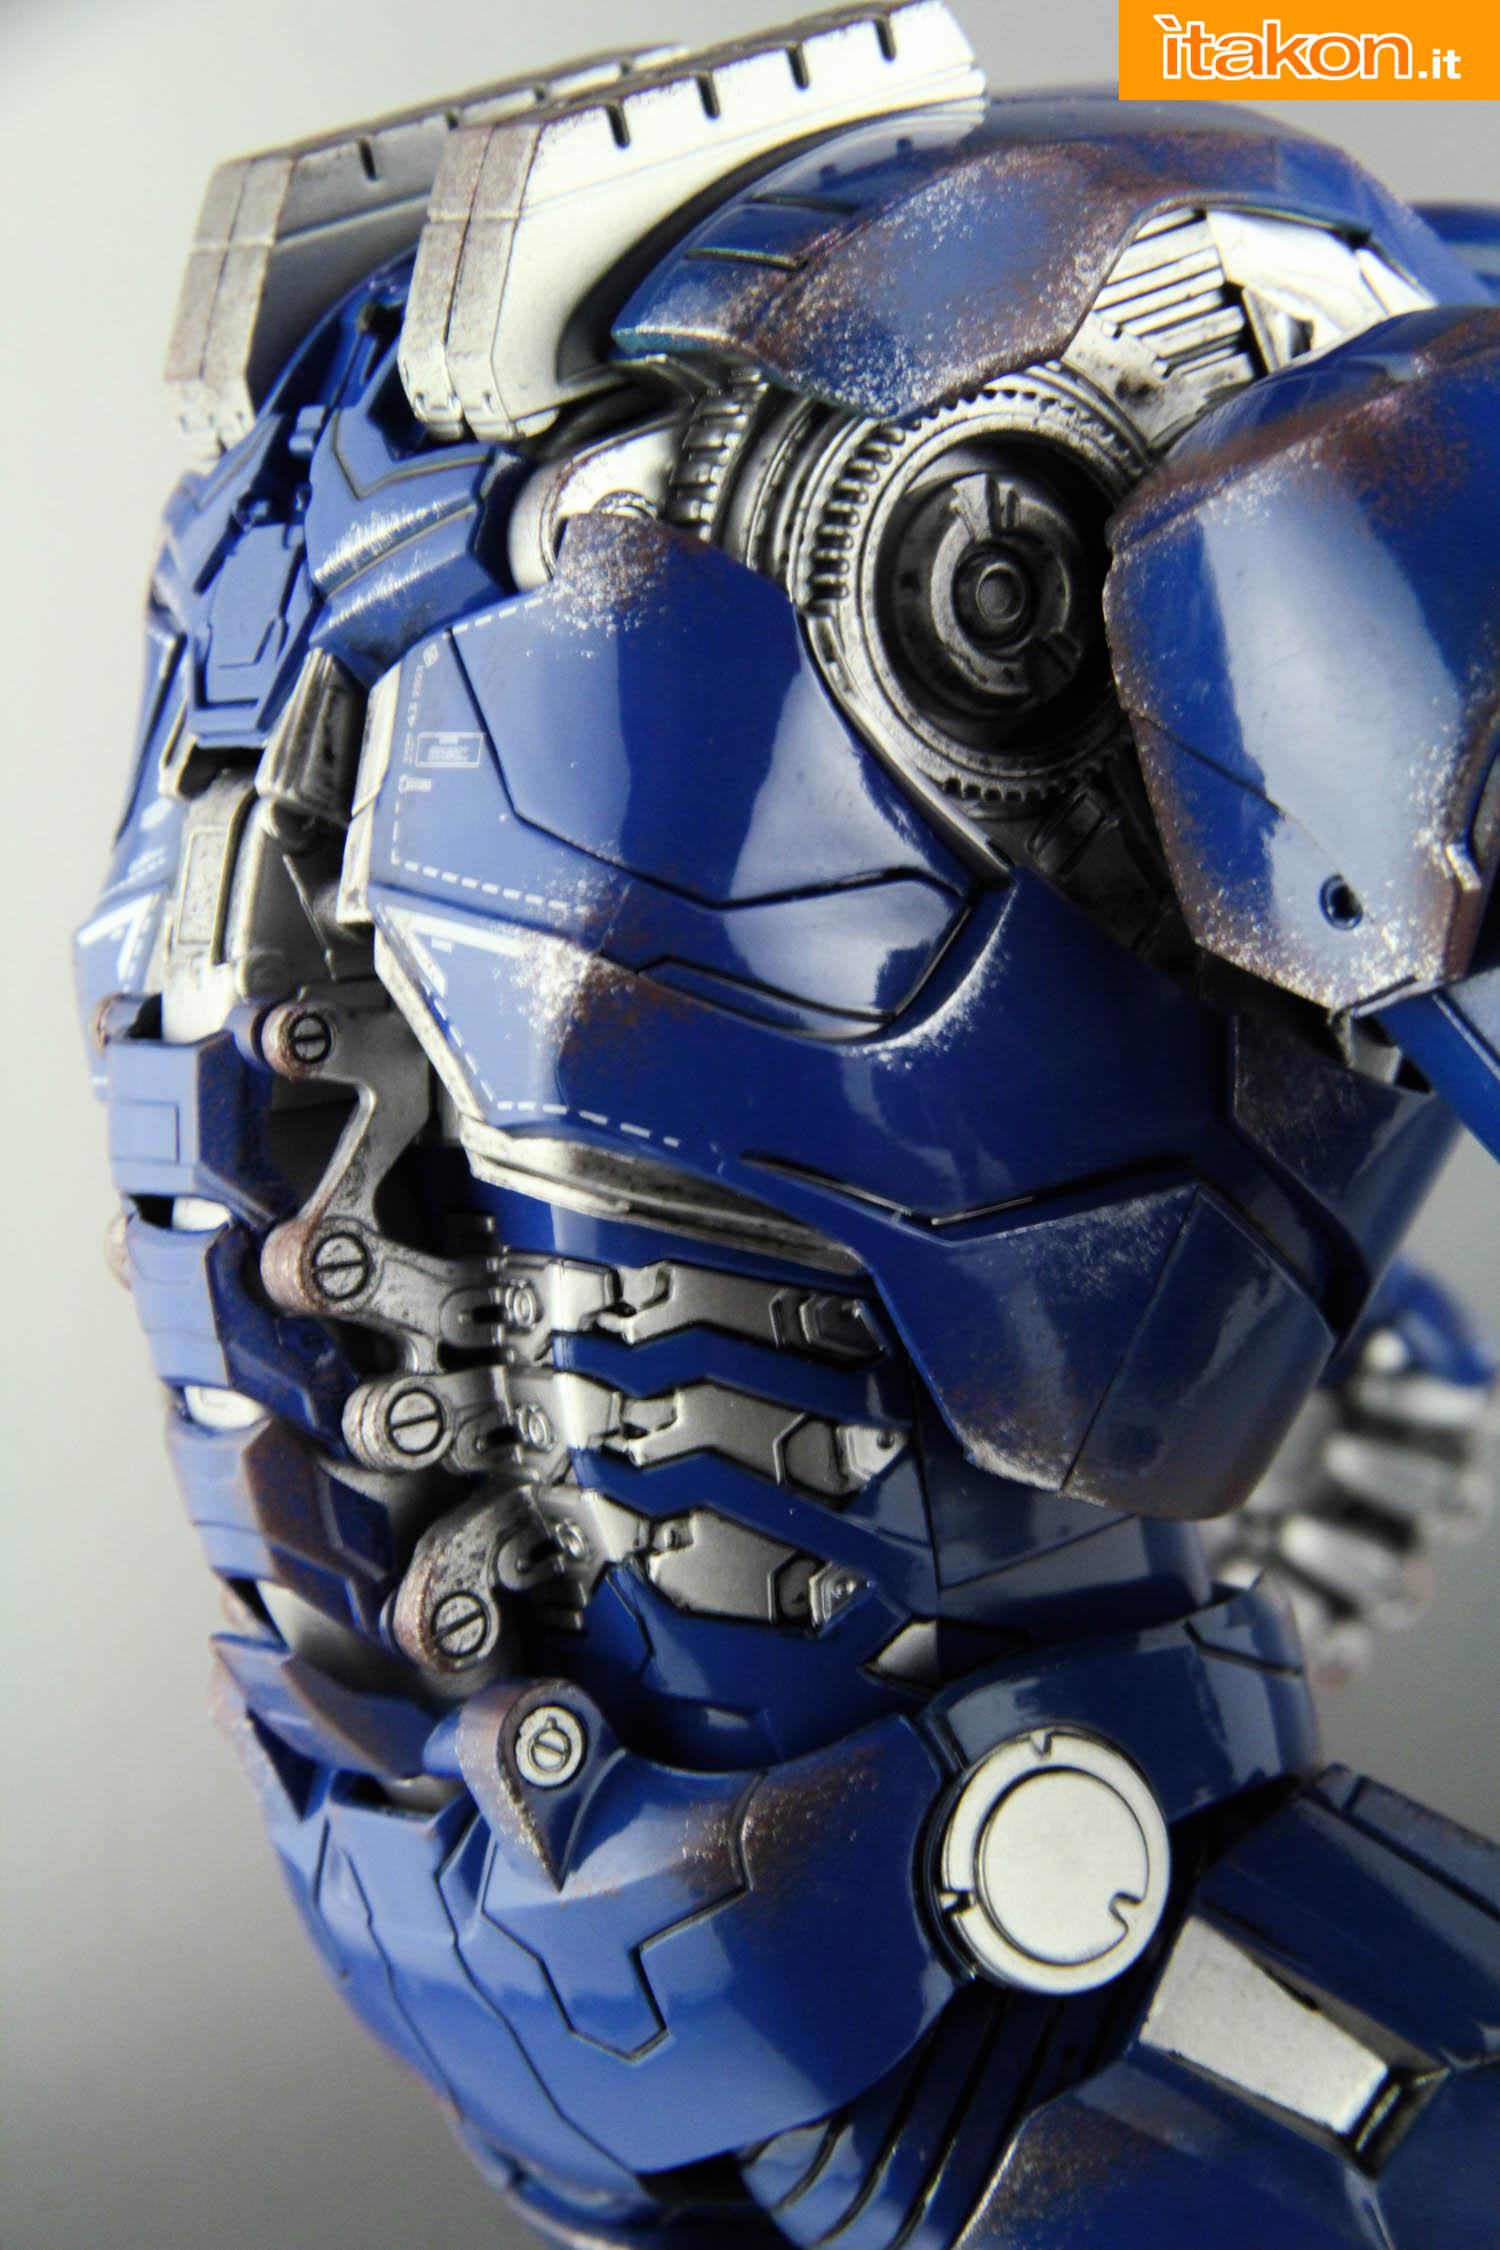 Link a comicave-igor-iron-man-figure-36